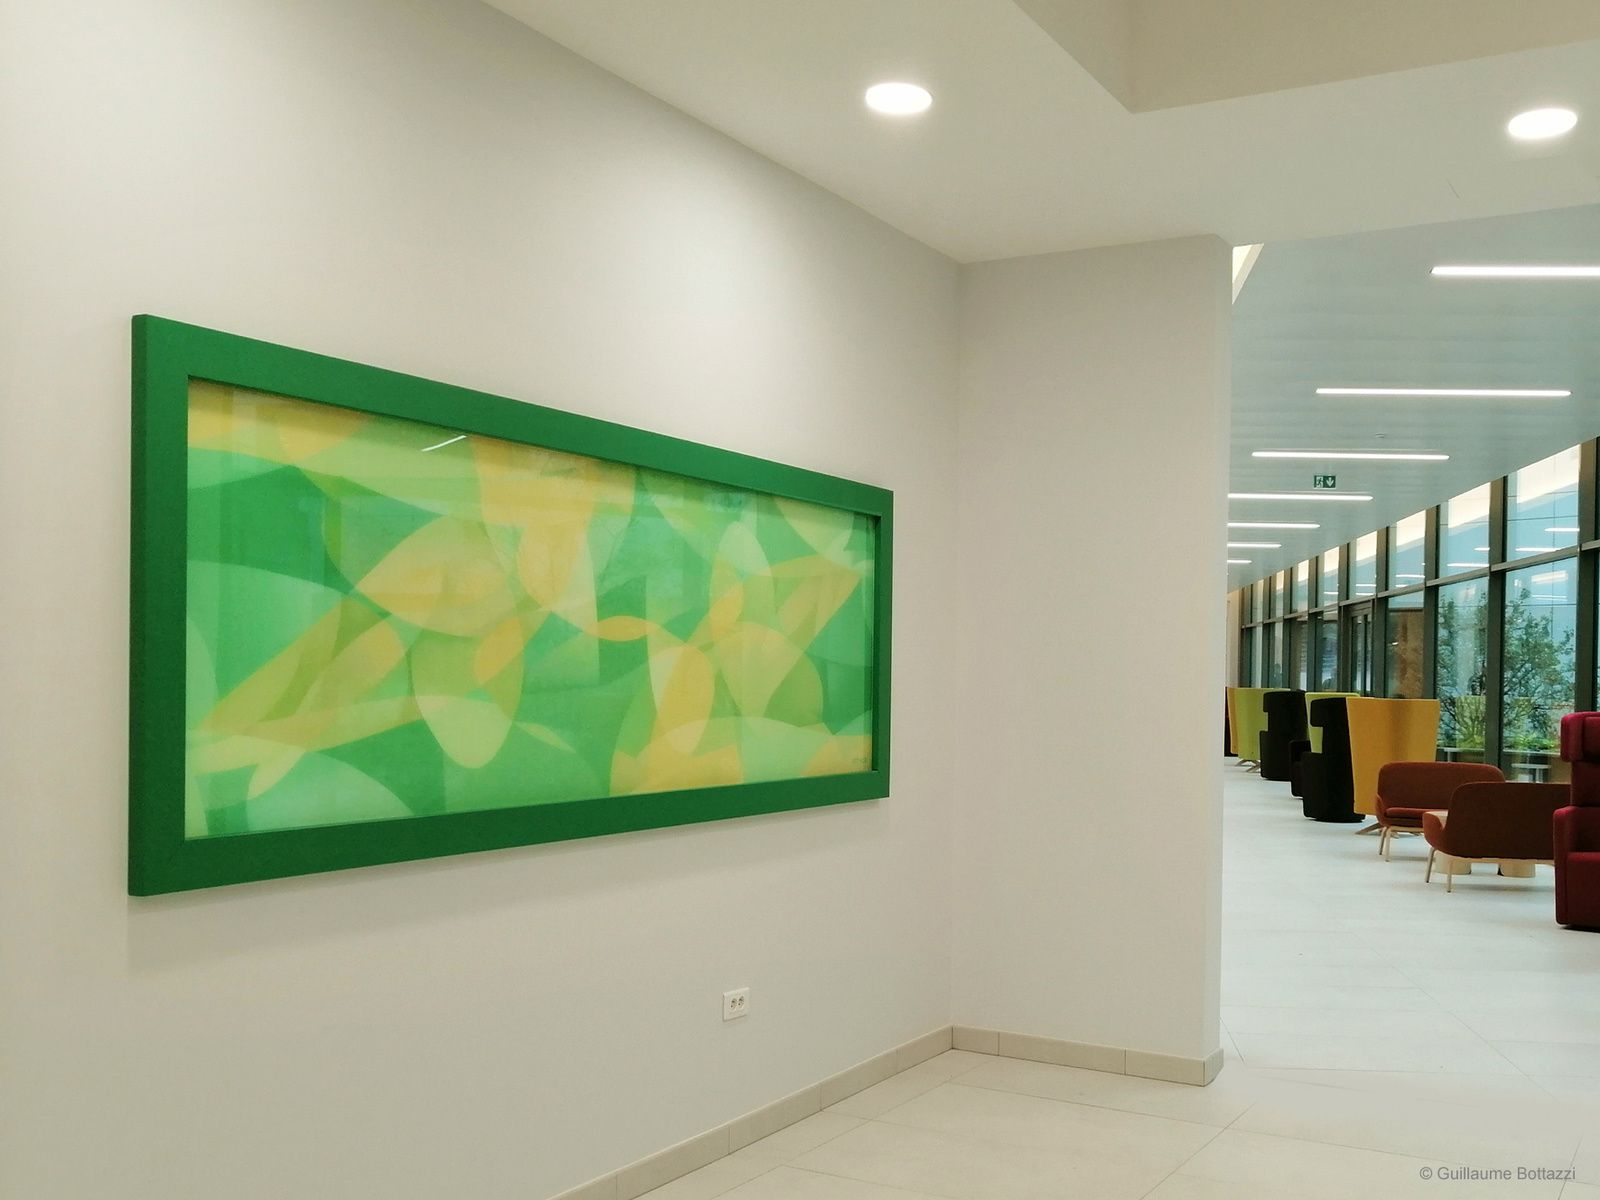 Guillaume Bottazzi art contemporain